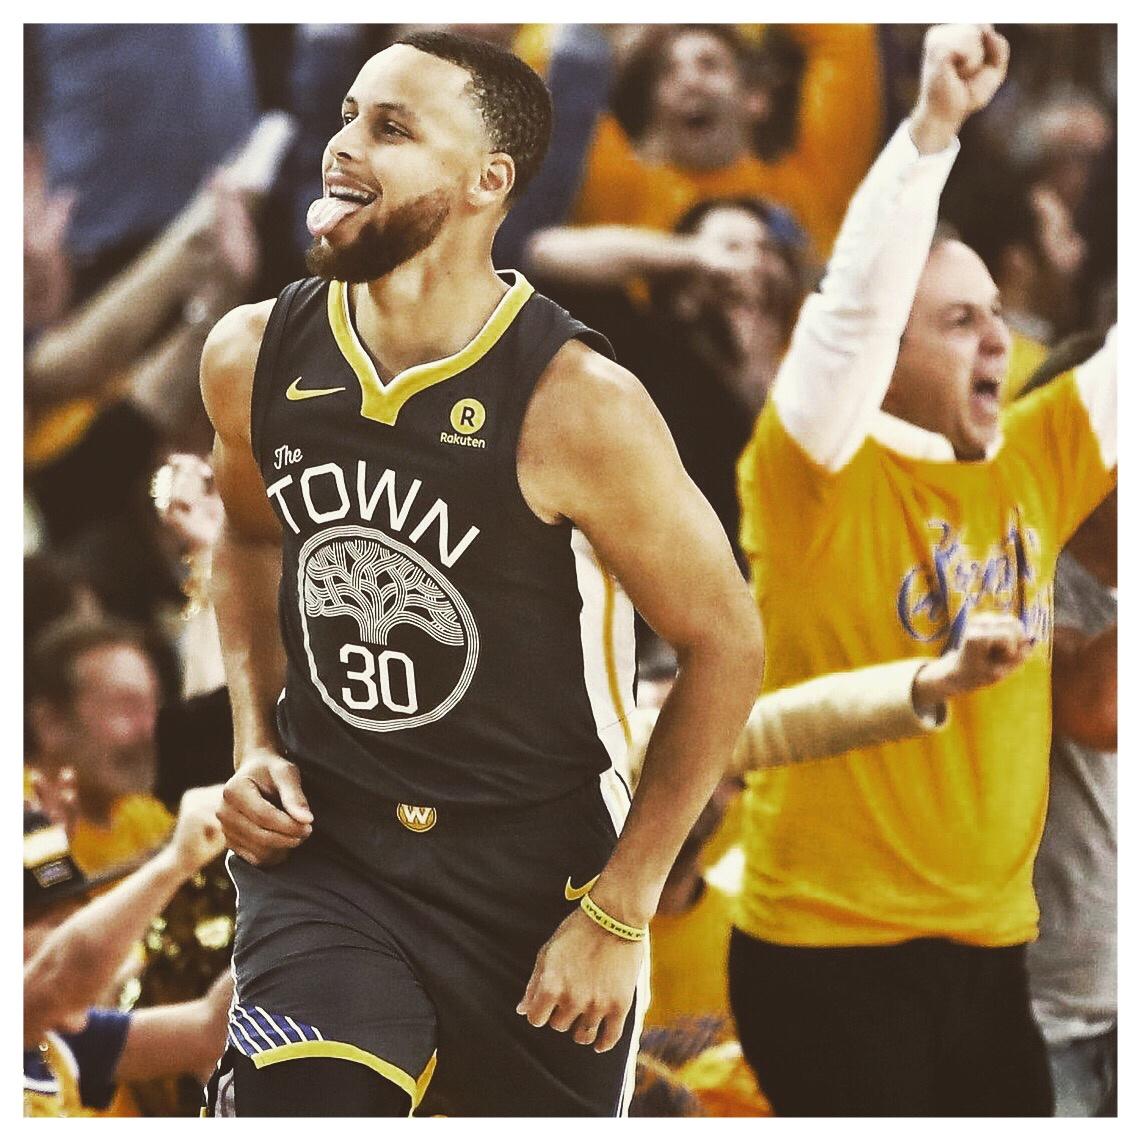 GOLDEN STATE WARRIORS - 2018 NBA CHAMPS